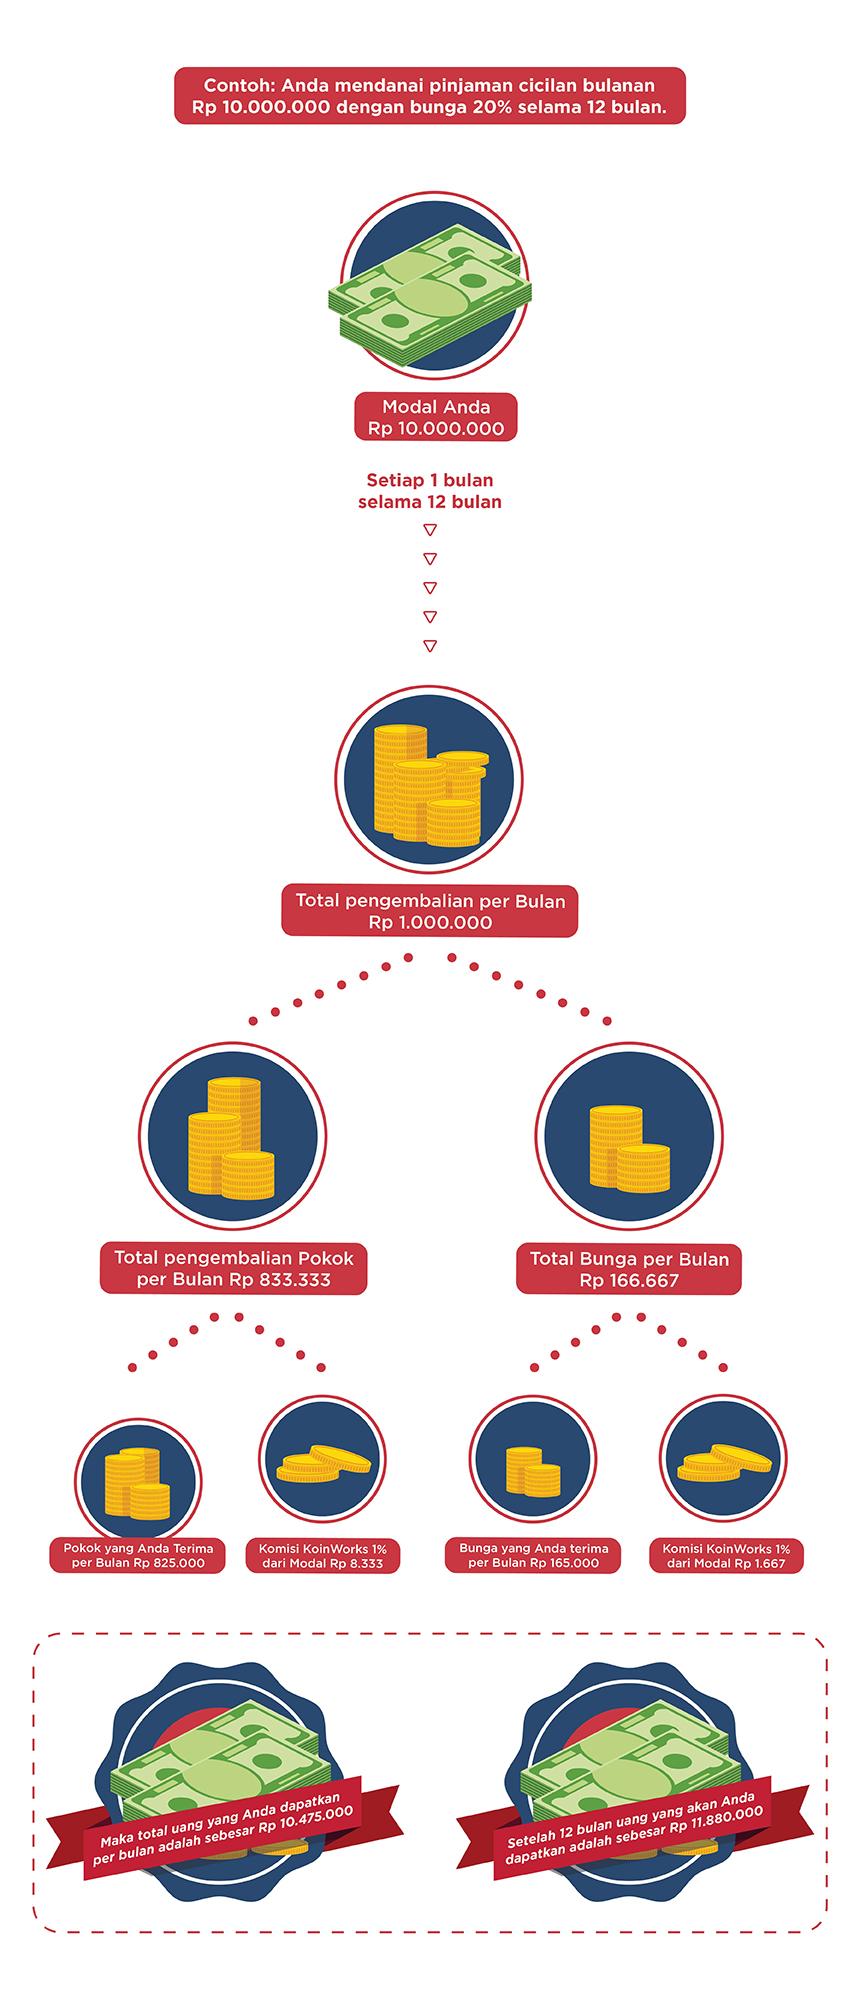 Ilustrasi Komisi KoinWorks untuk Pinjaman Cicilan